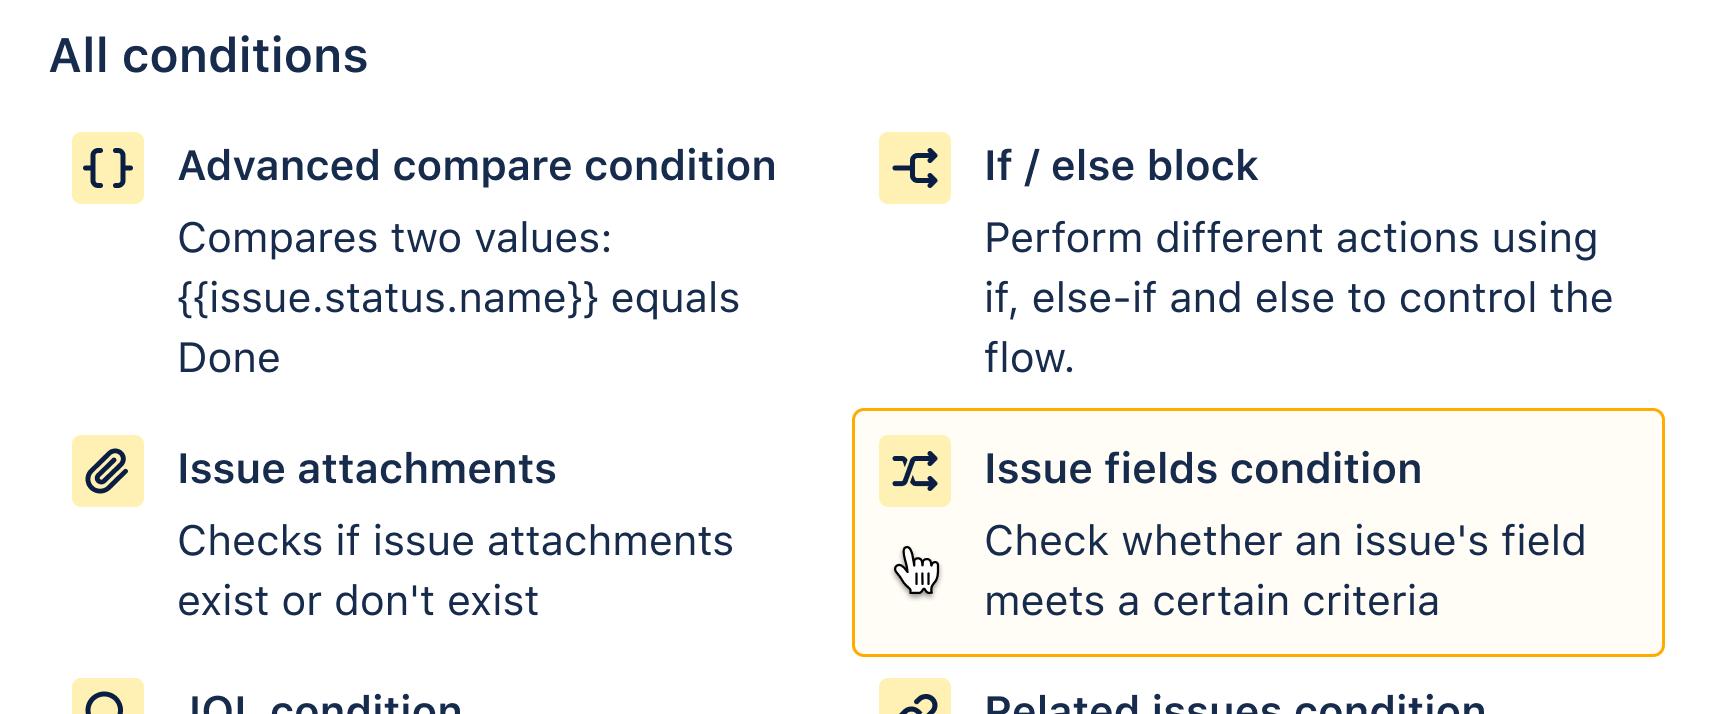 Adding issue fields condition